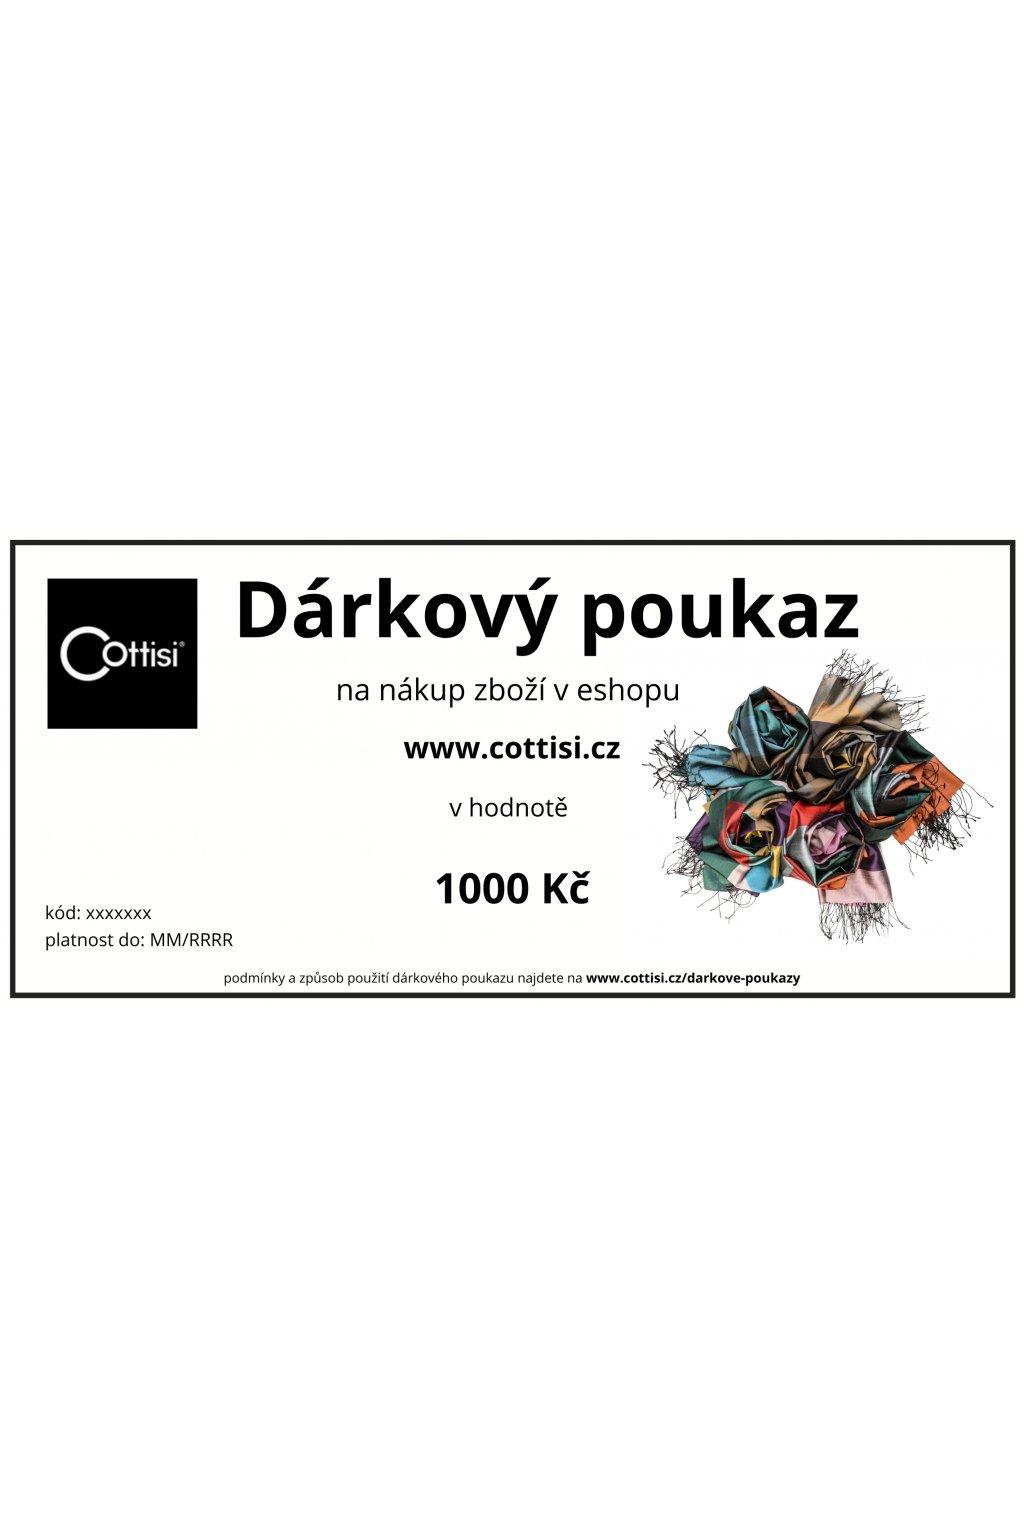 DV 1000